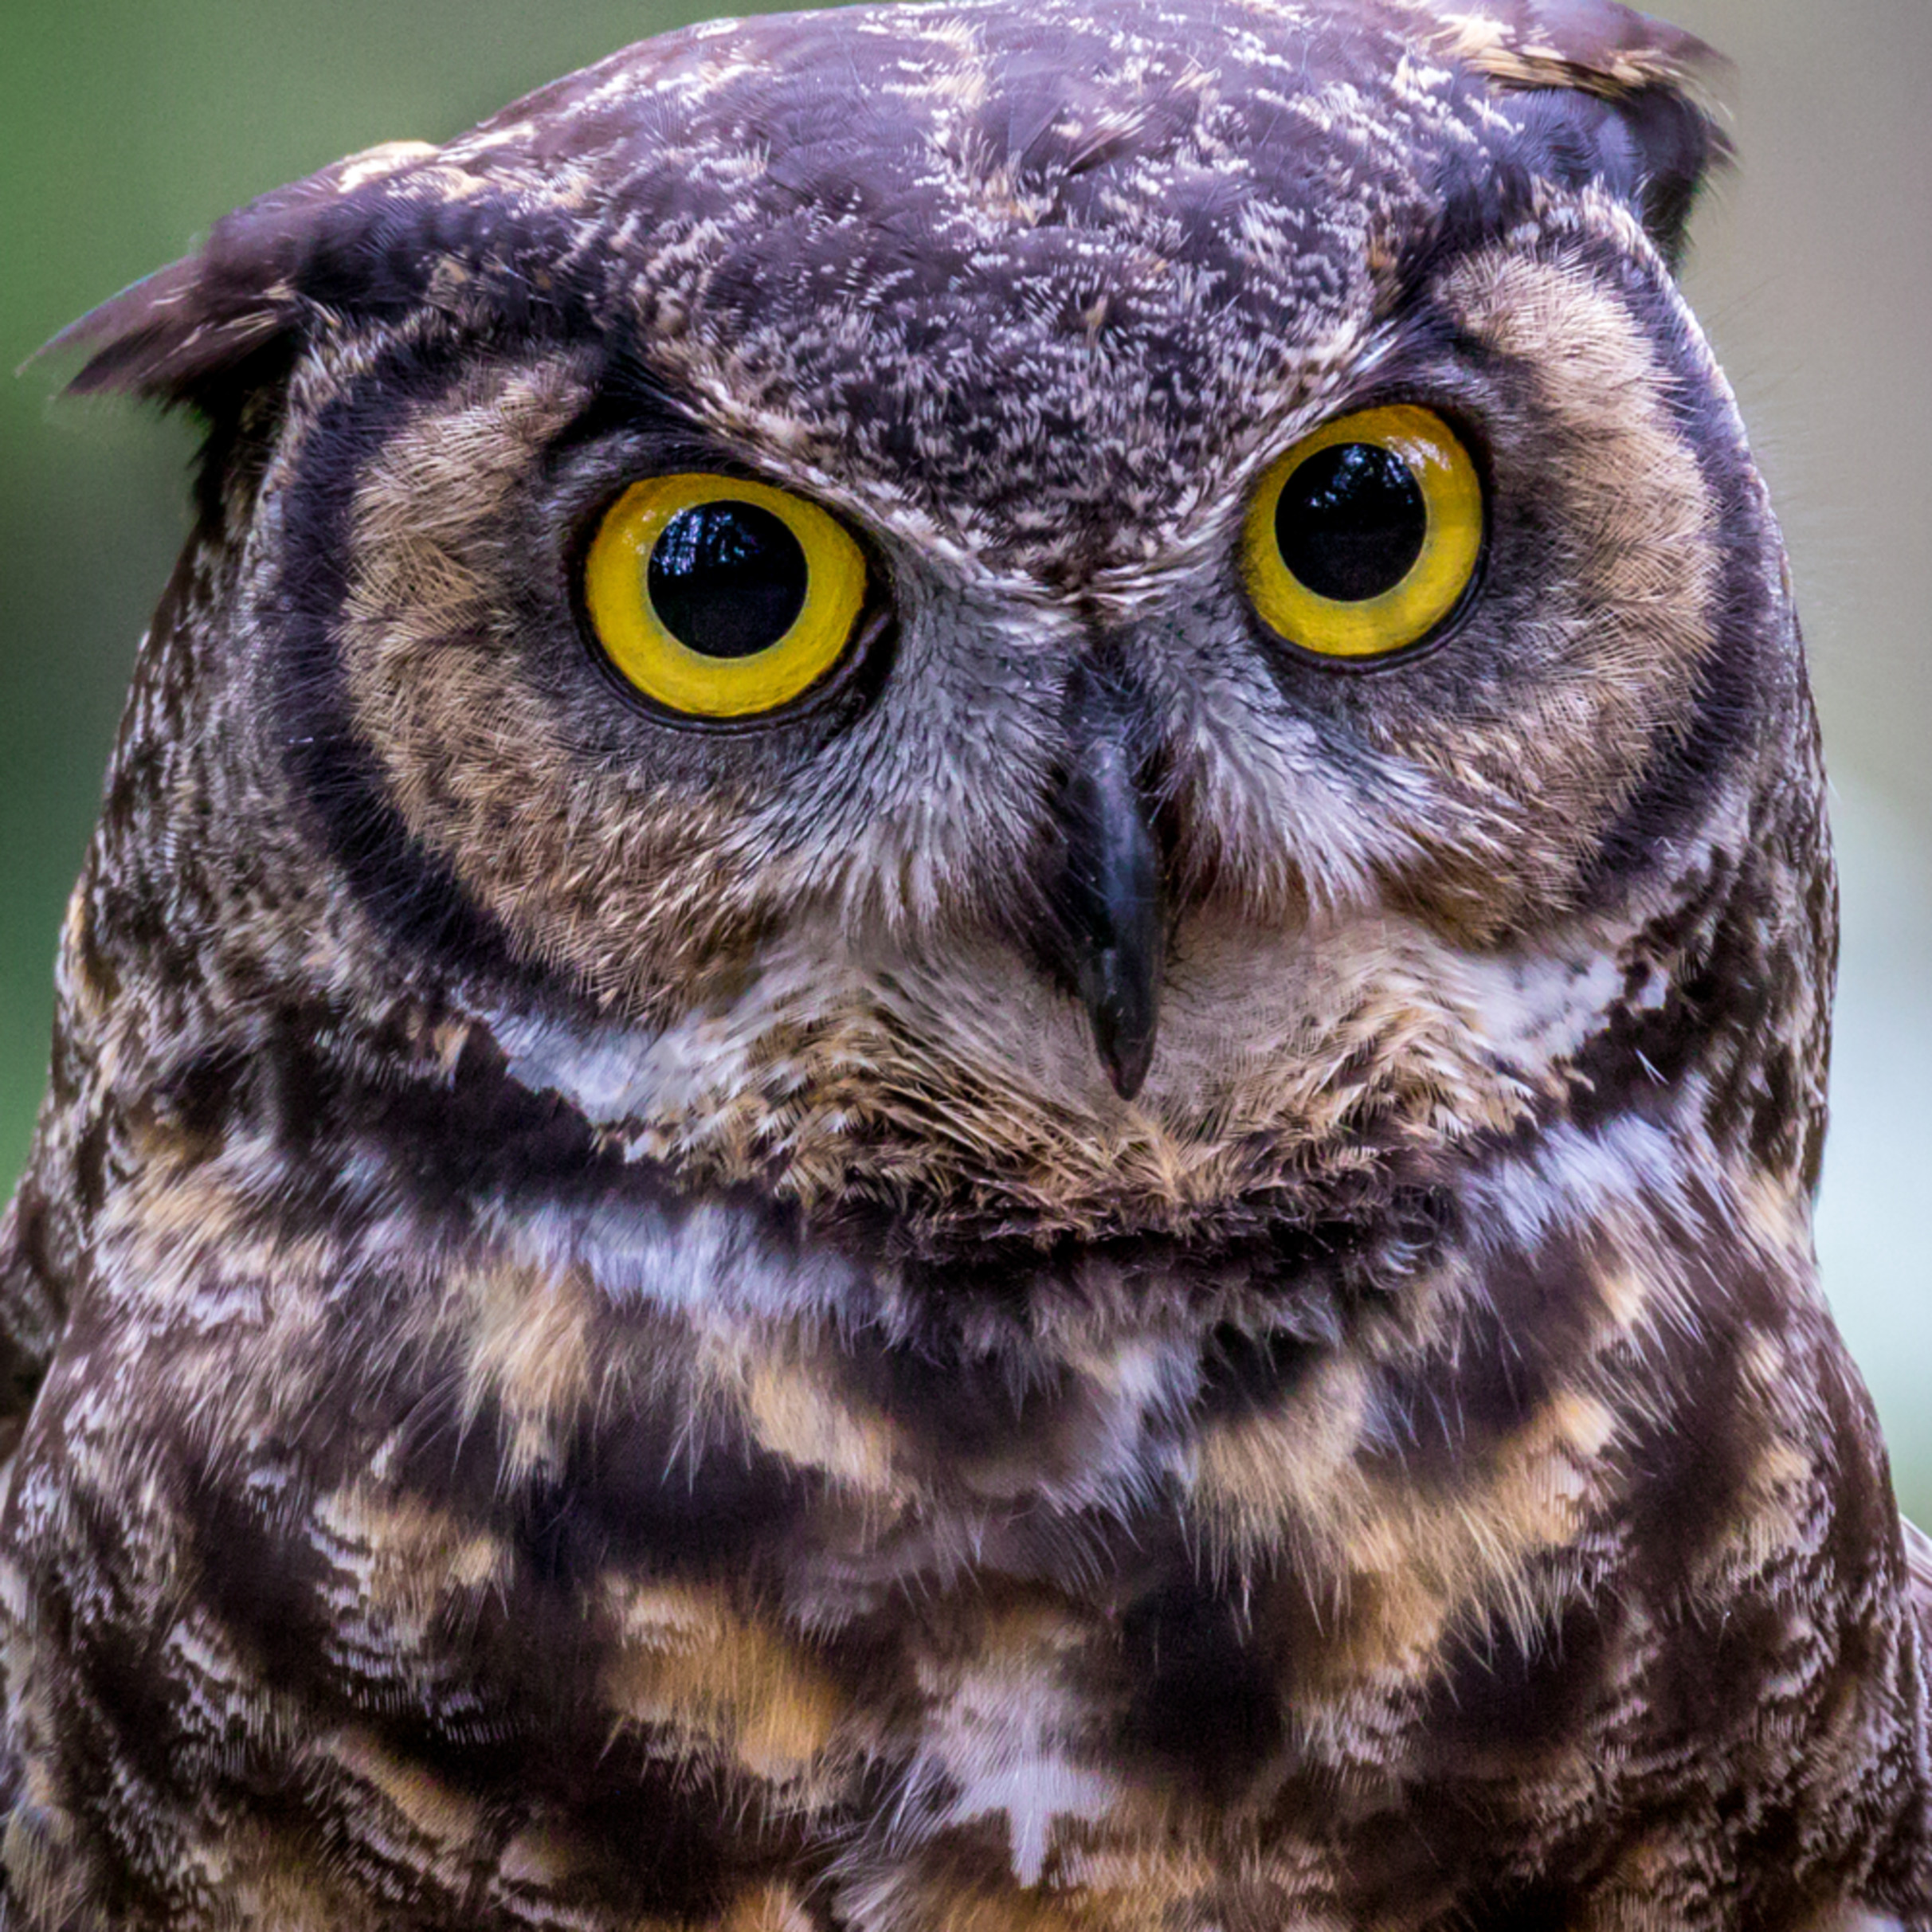 Asf horned owl 9963 cdtzfa